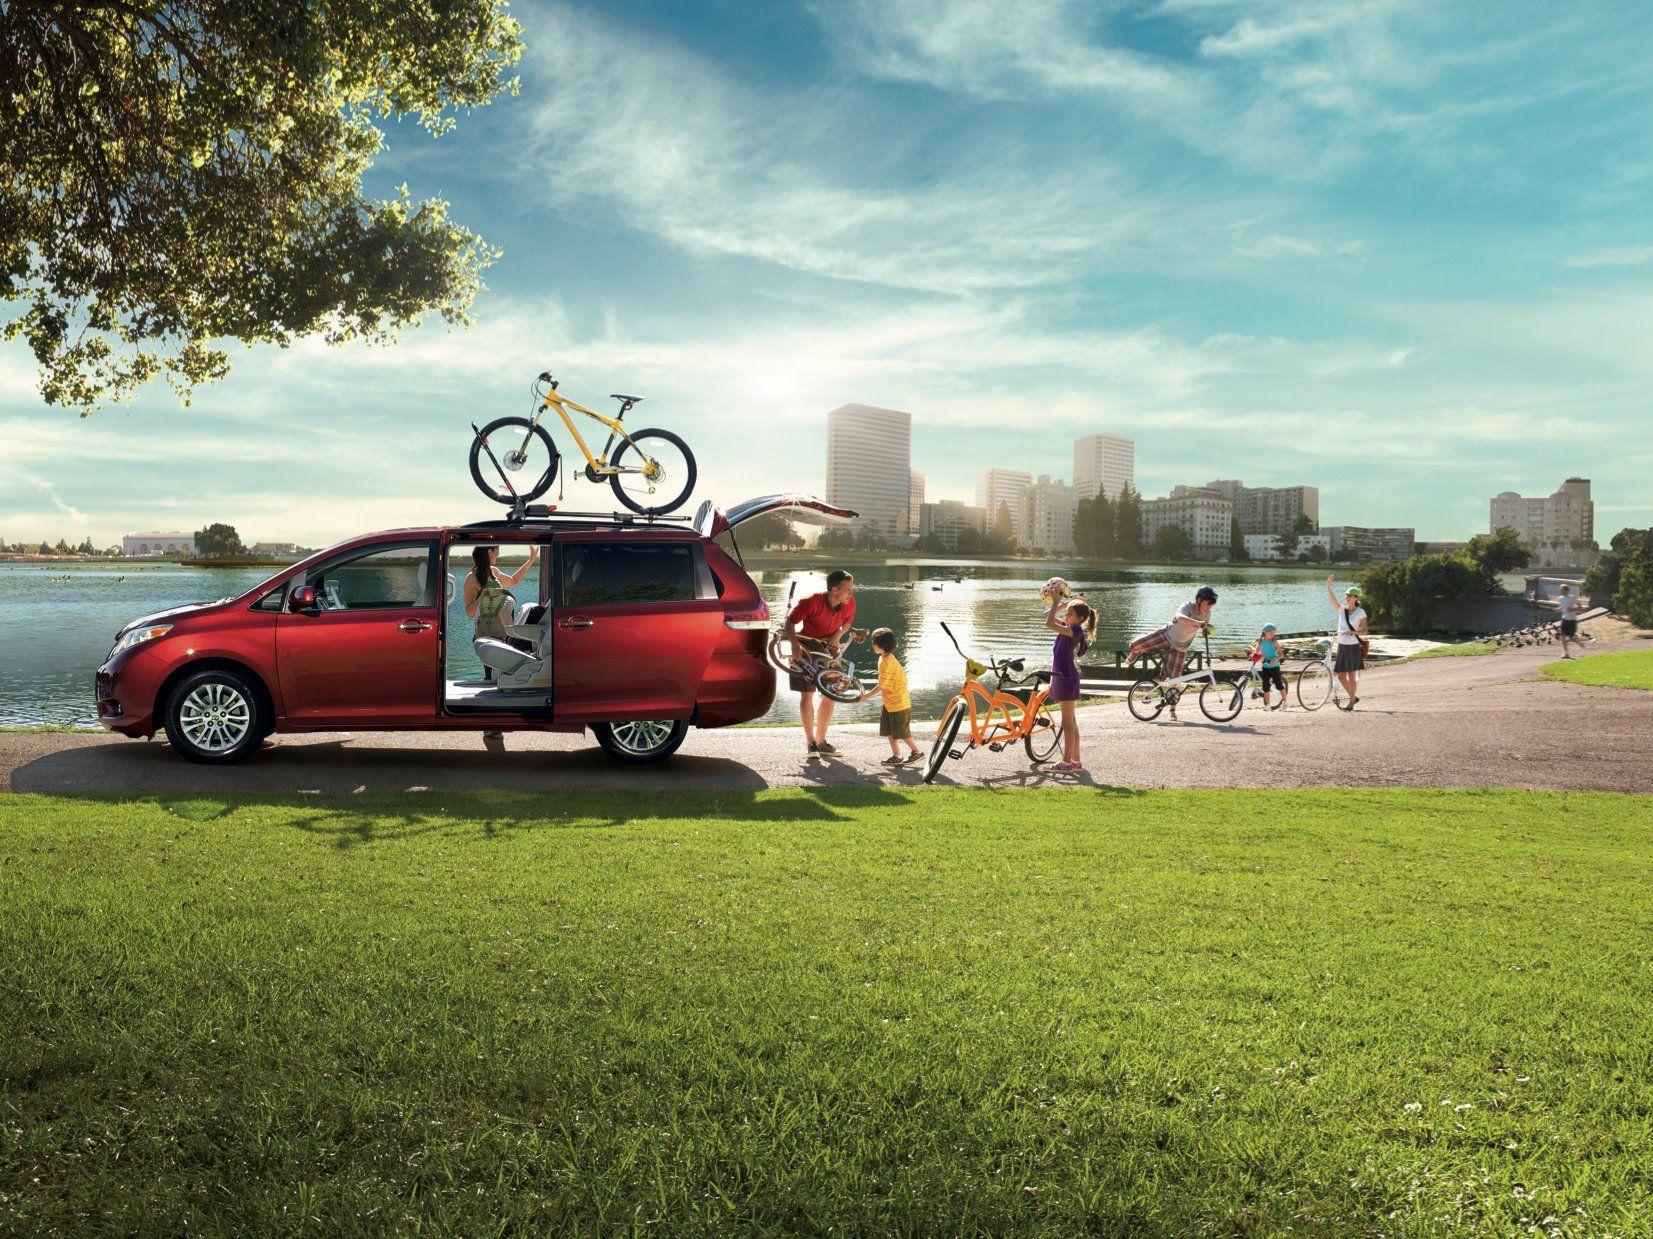 It's the Swagger Wagon! Satya Photography S. USA Toyota